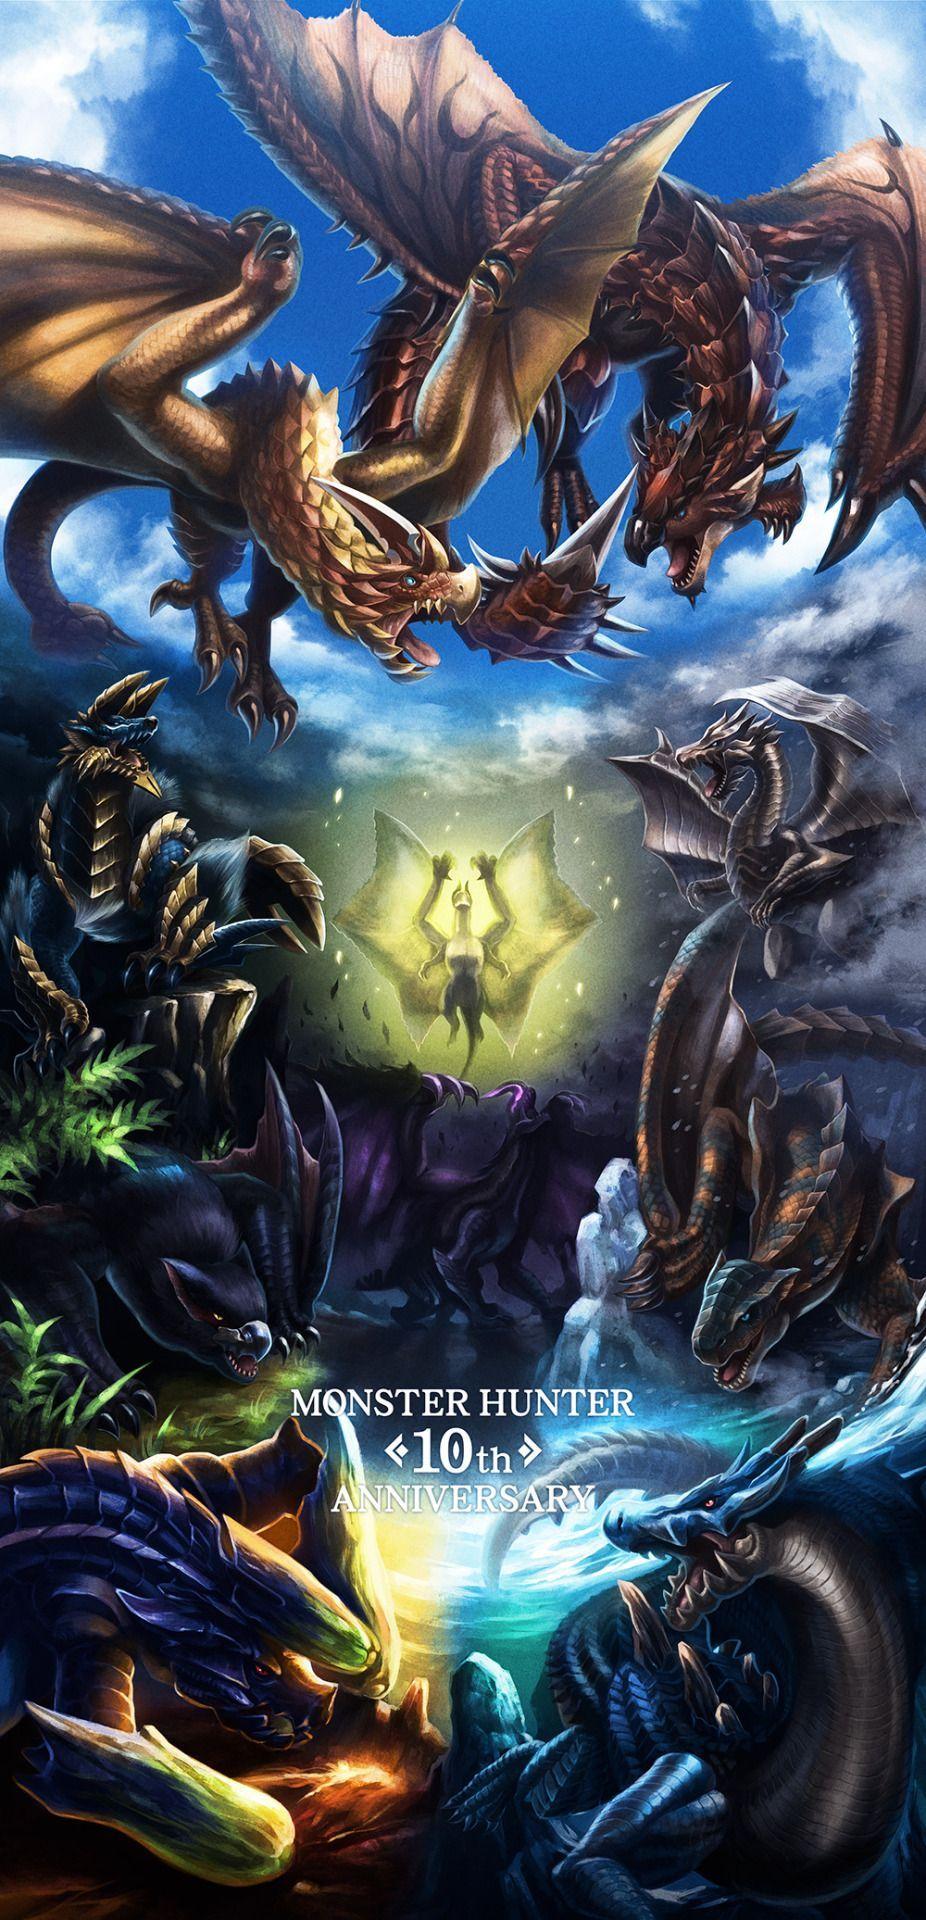 Monster Hunter Phone HD Wallpapers - Wallpaper Cave